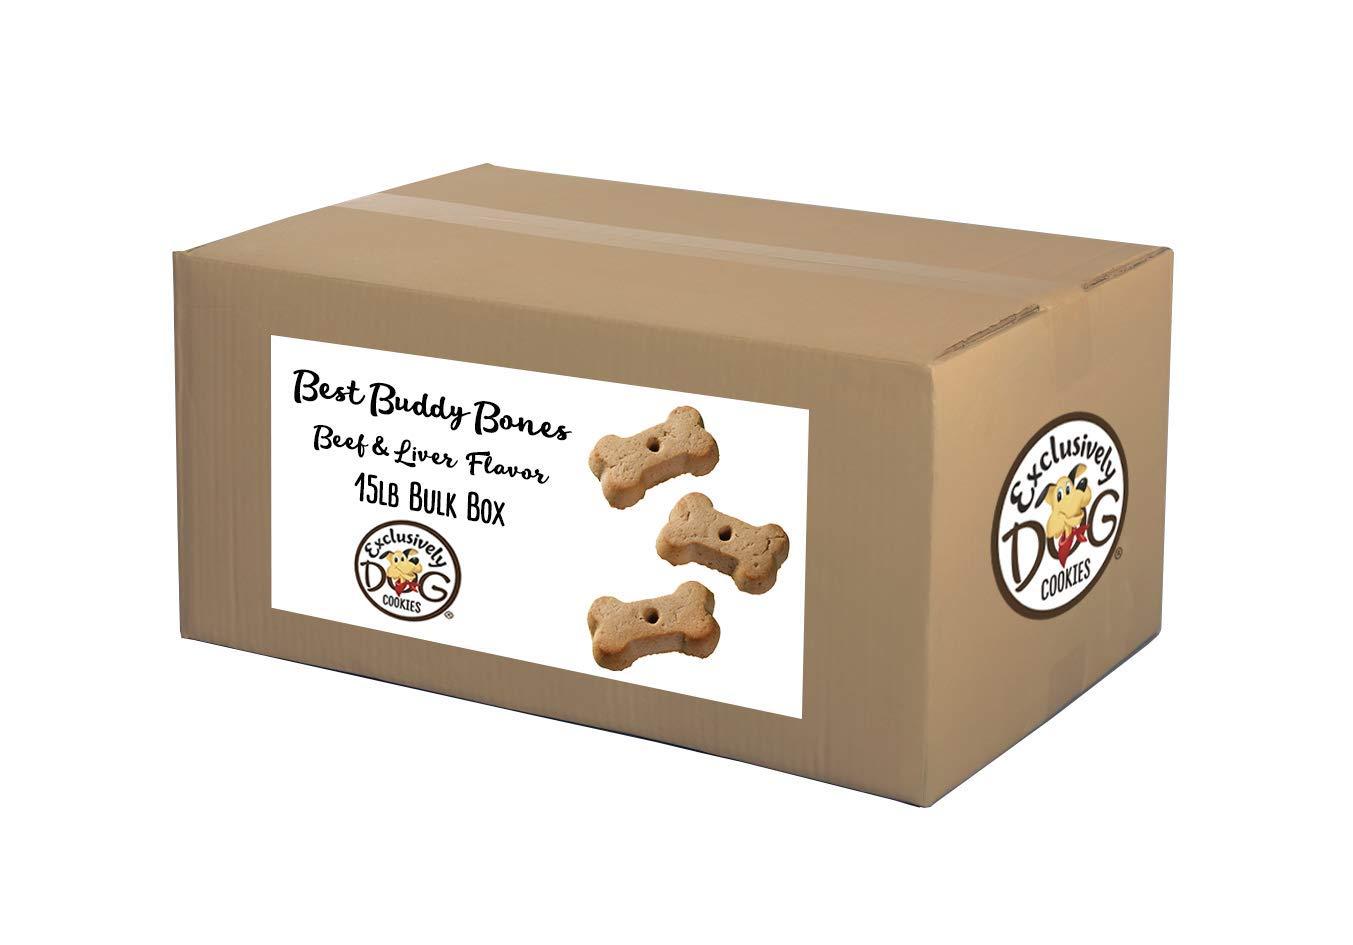 Exclusively Pet Best Buddy Bones-Peanut Butter Flavor, 15-Pound Box